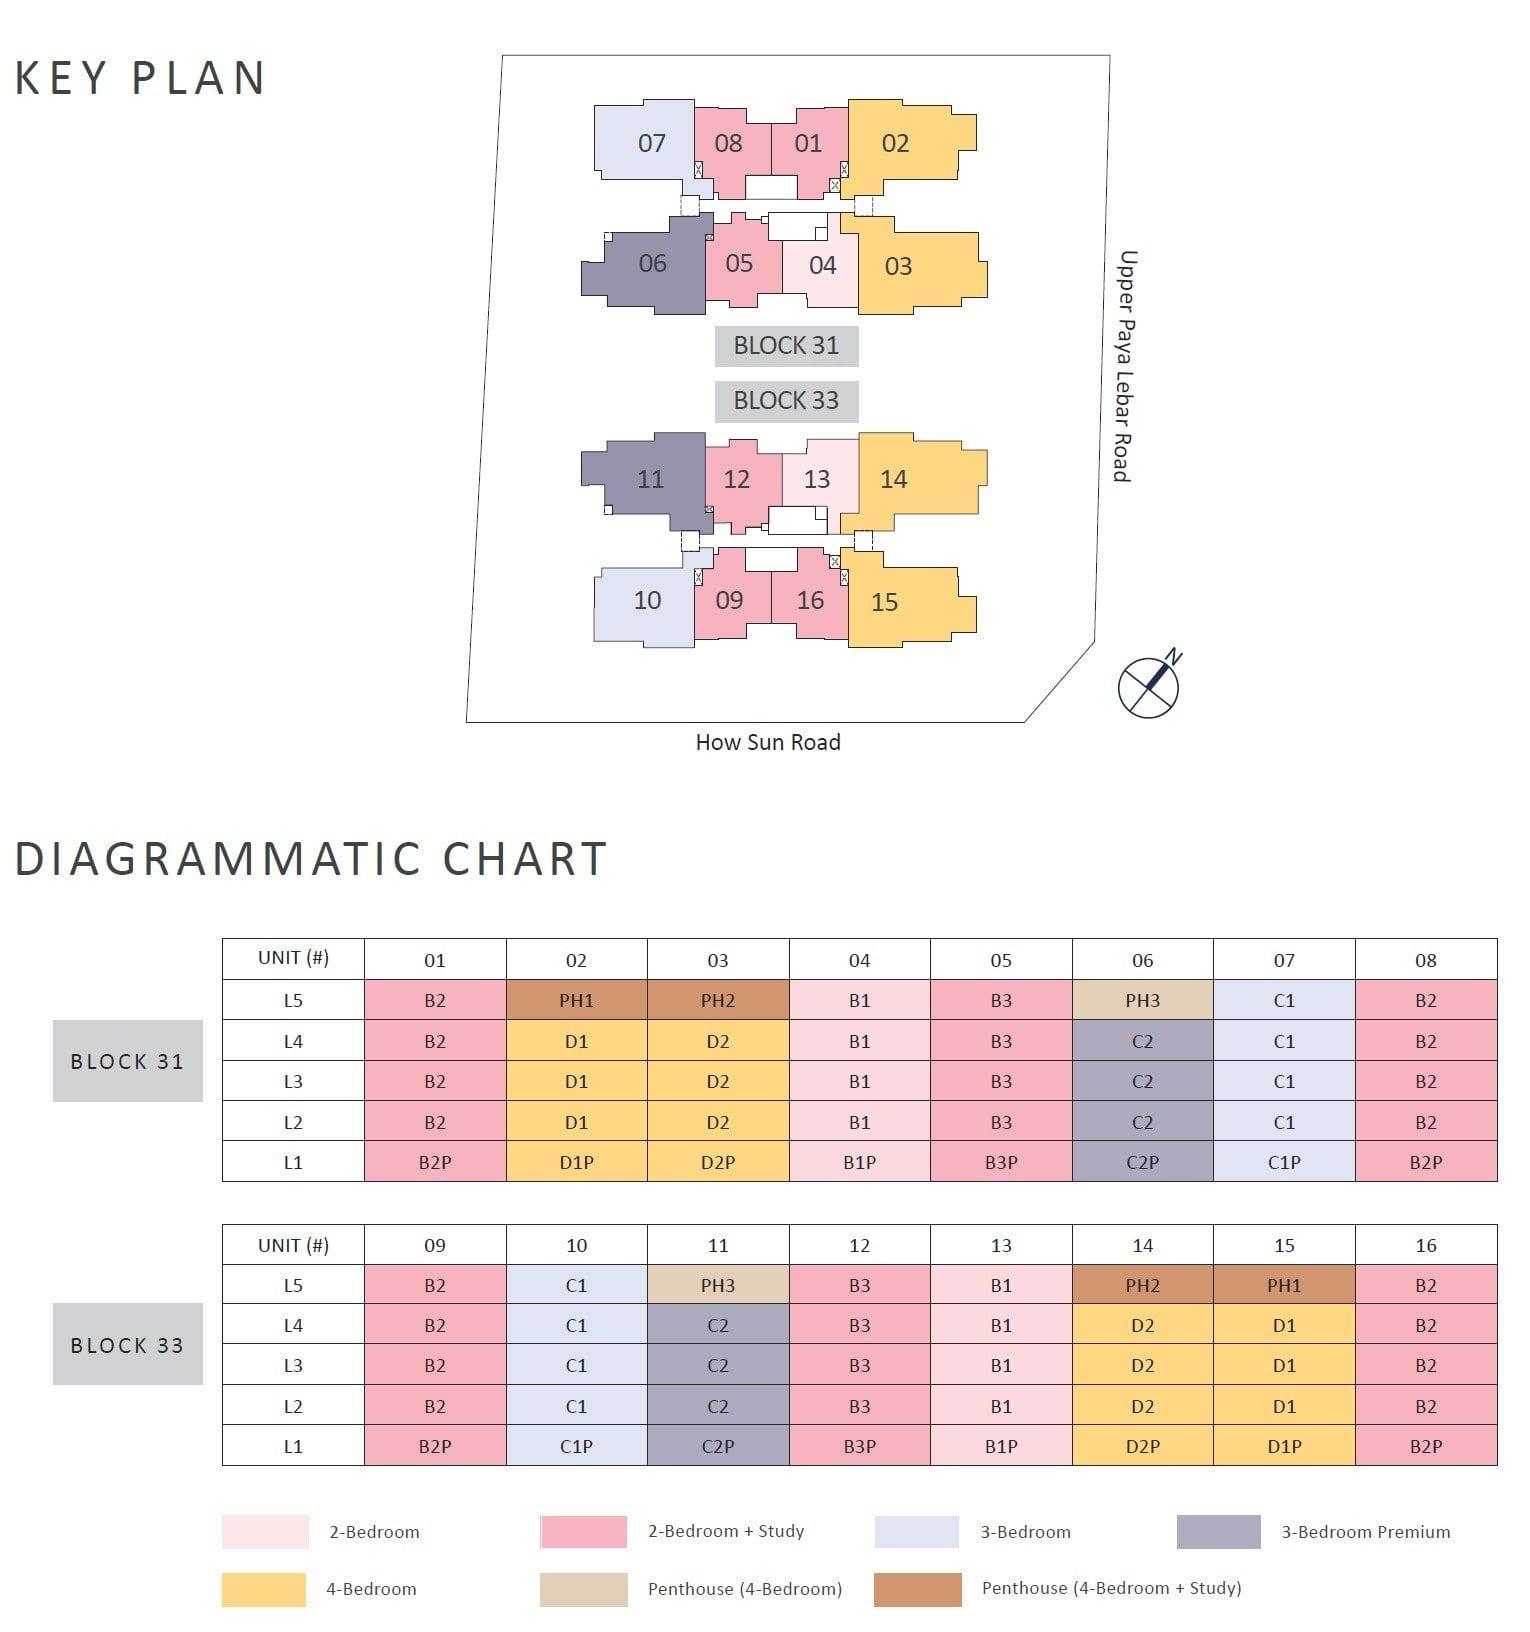 The-Lilium-diagrammatic-chart